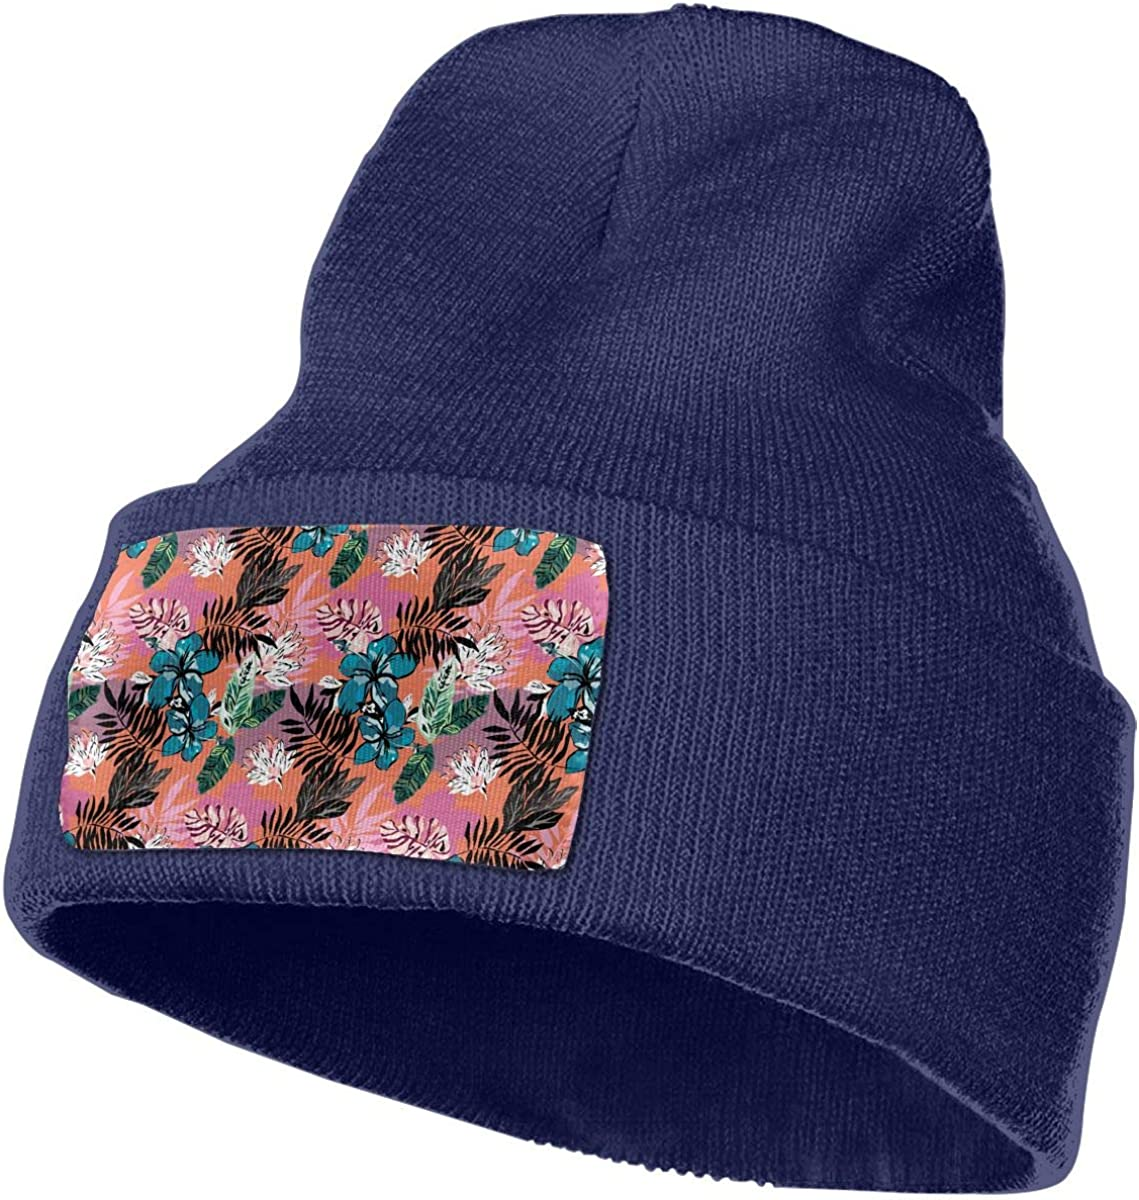 Beautiful Flower Art Unisex Fashion Knitted Hat Luxury Hip-Hop Cap